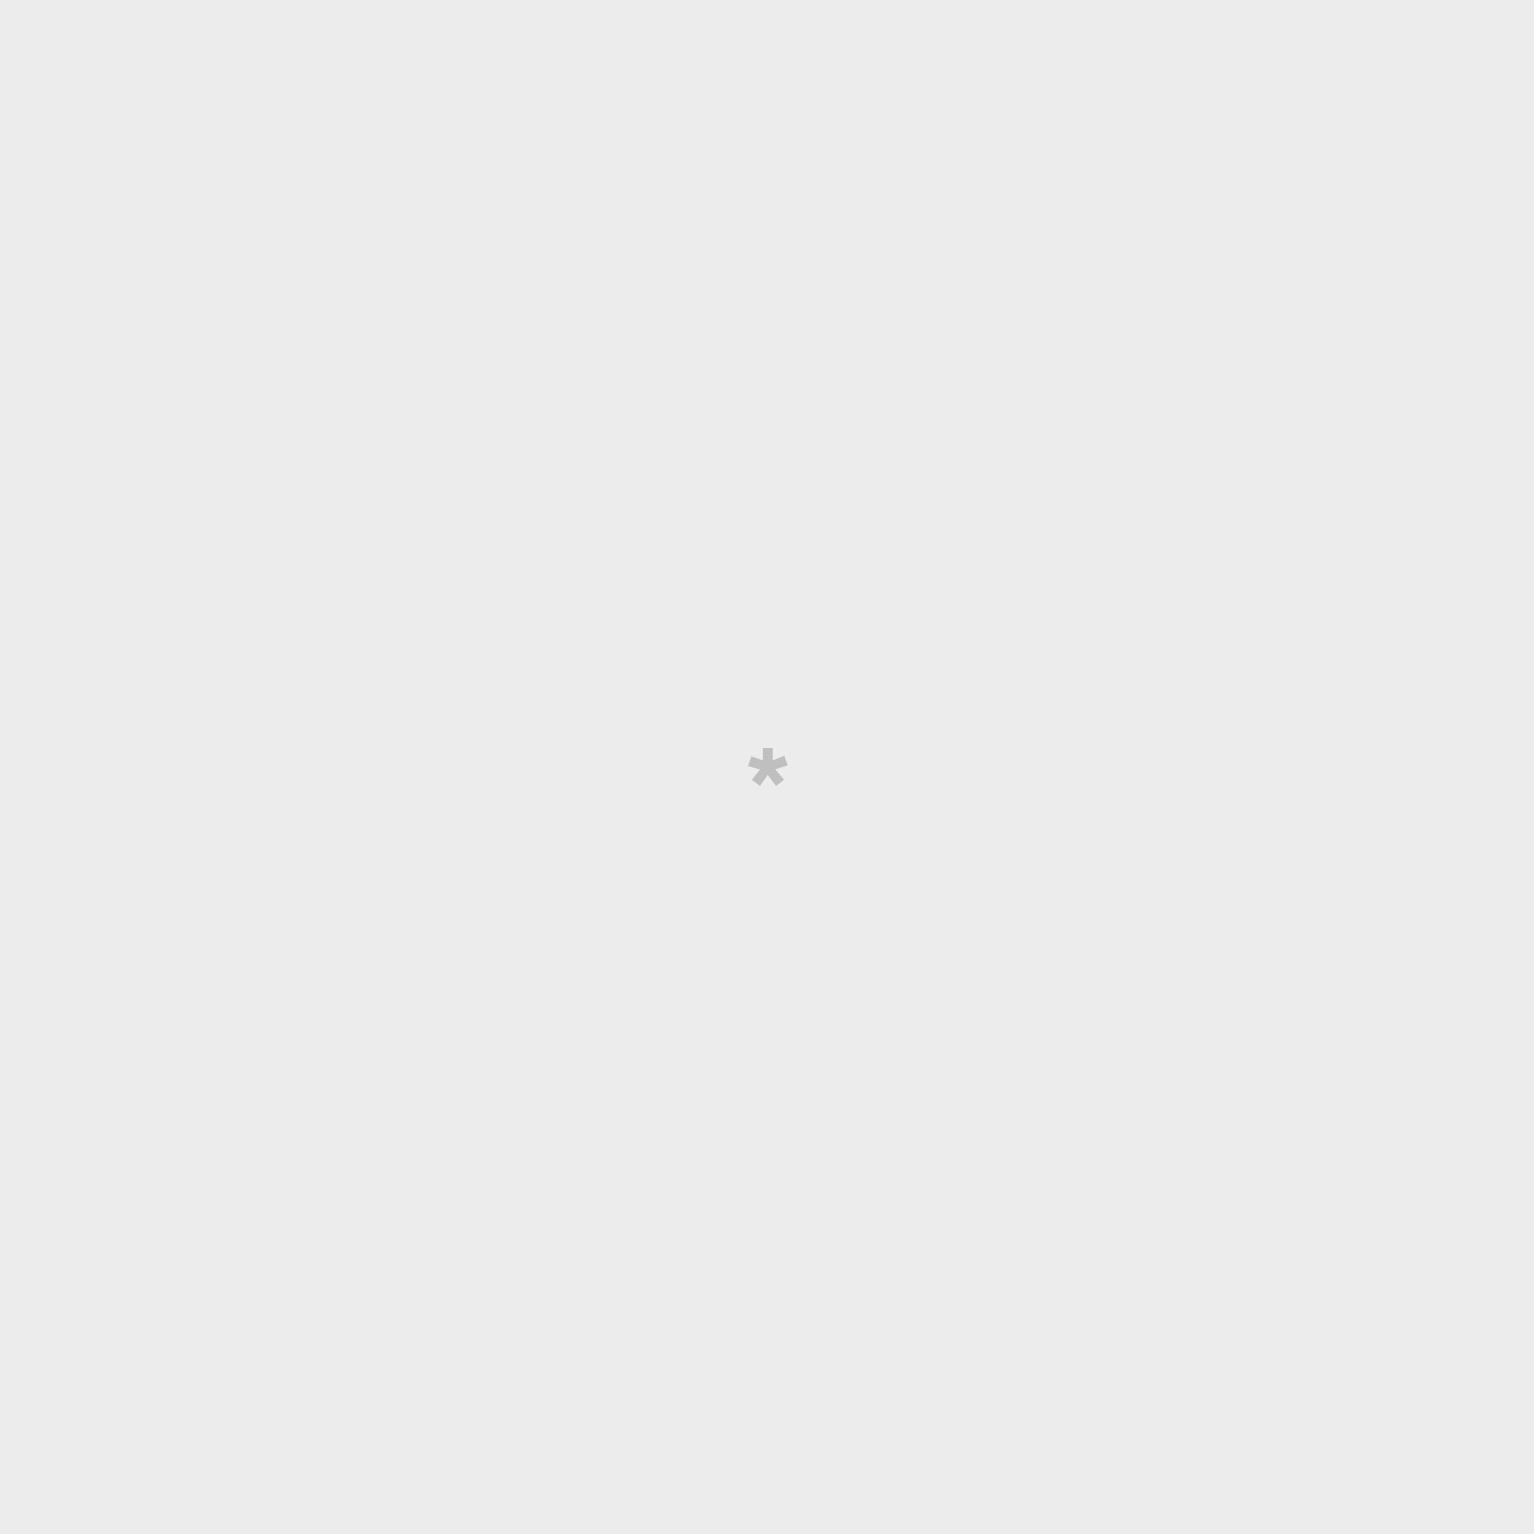 Super cute bottle opener - Avocado